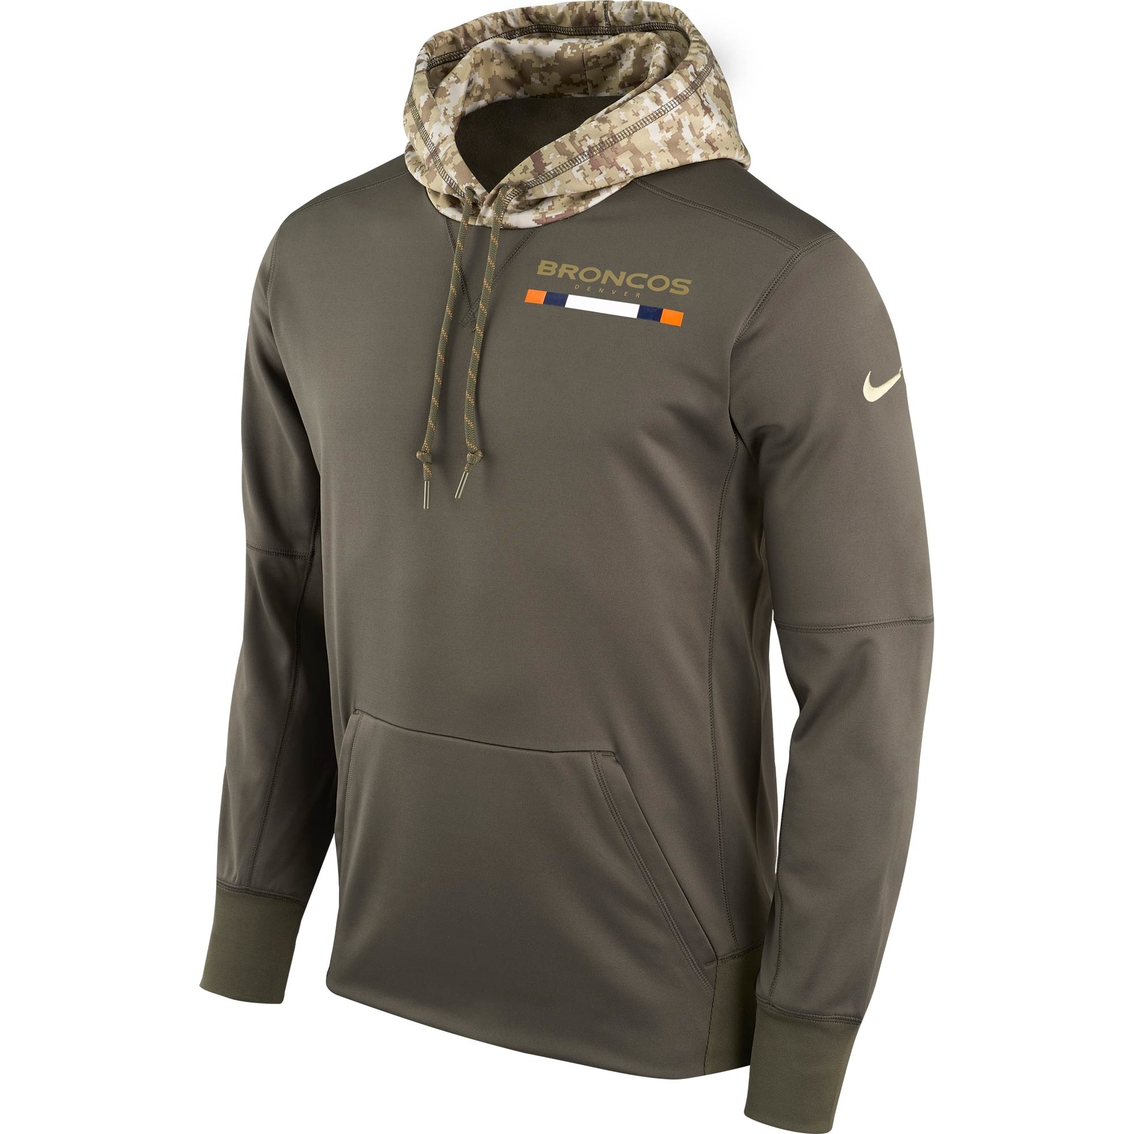 innovative design c2ea0 557d7 Nike Nfl Denver Broncos Salute To Service Hoodie | Hoodies ...